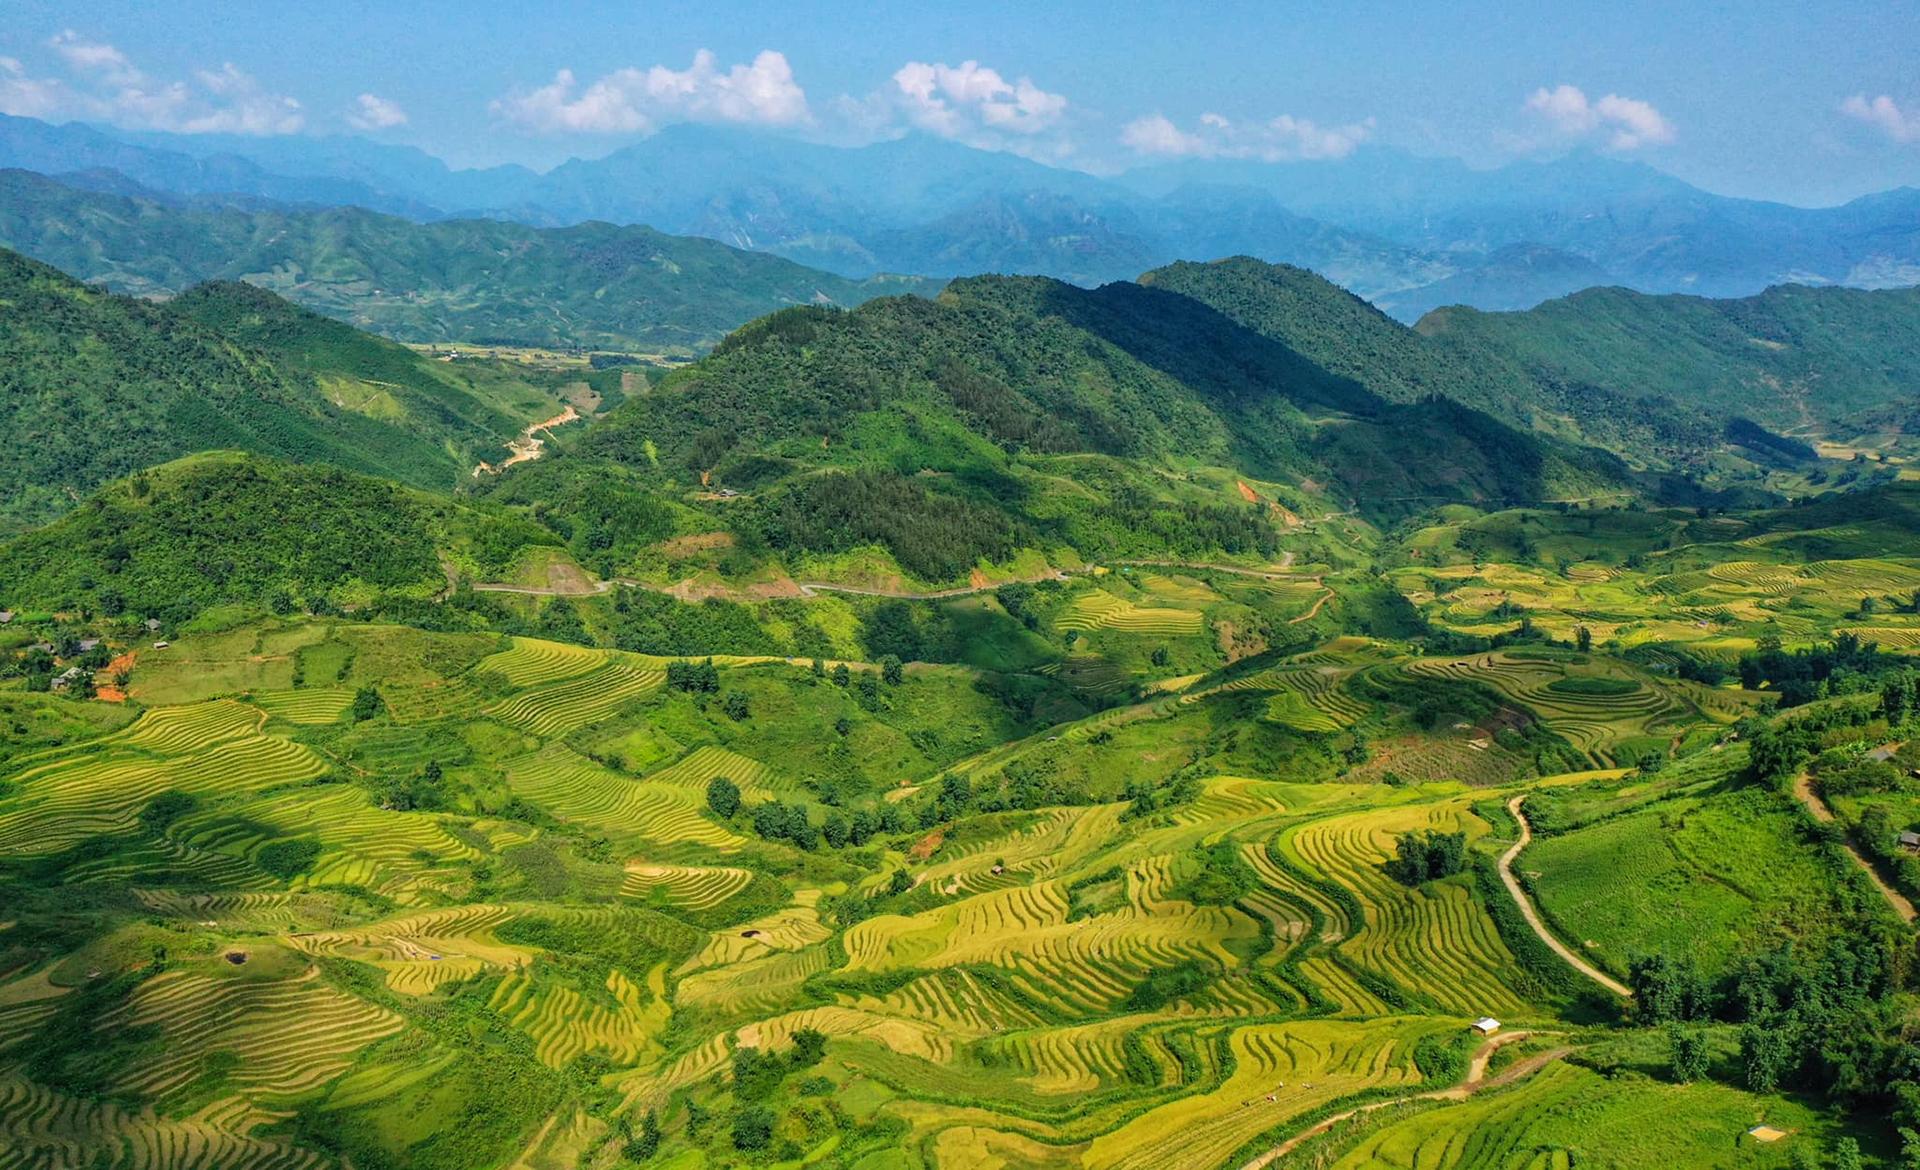 ripening rice season adorns beauty of northern vietnam